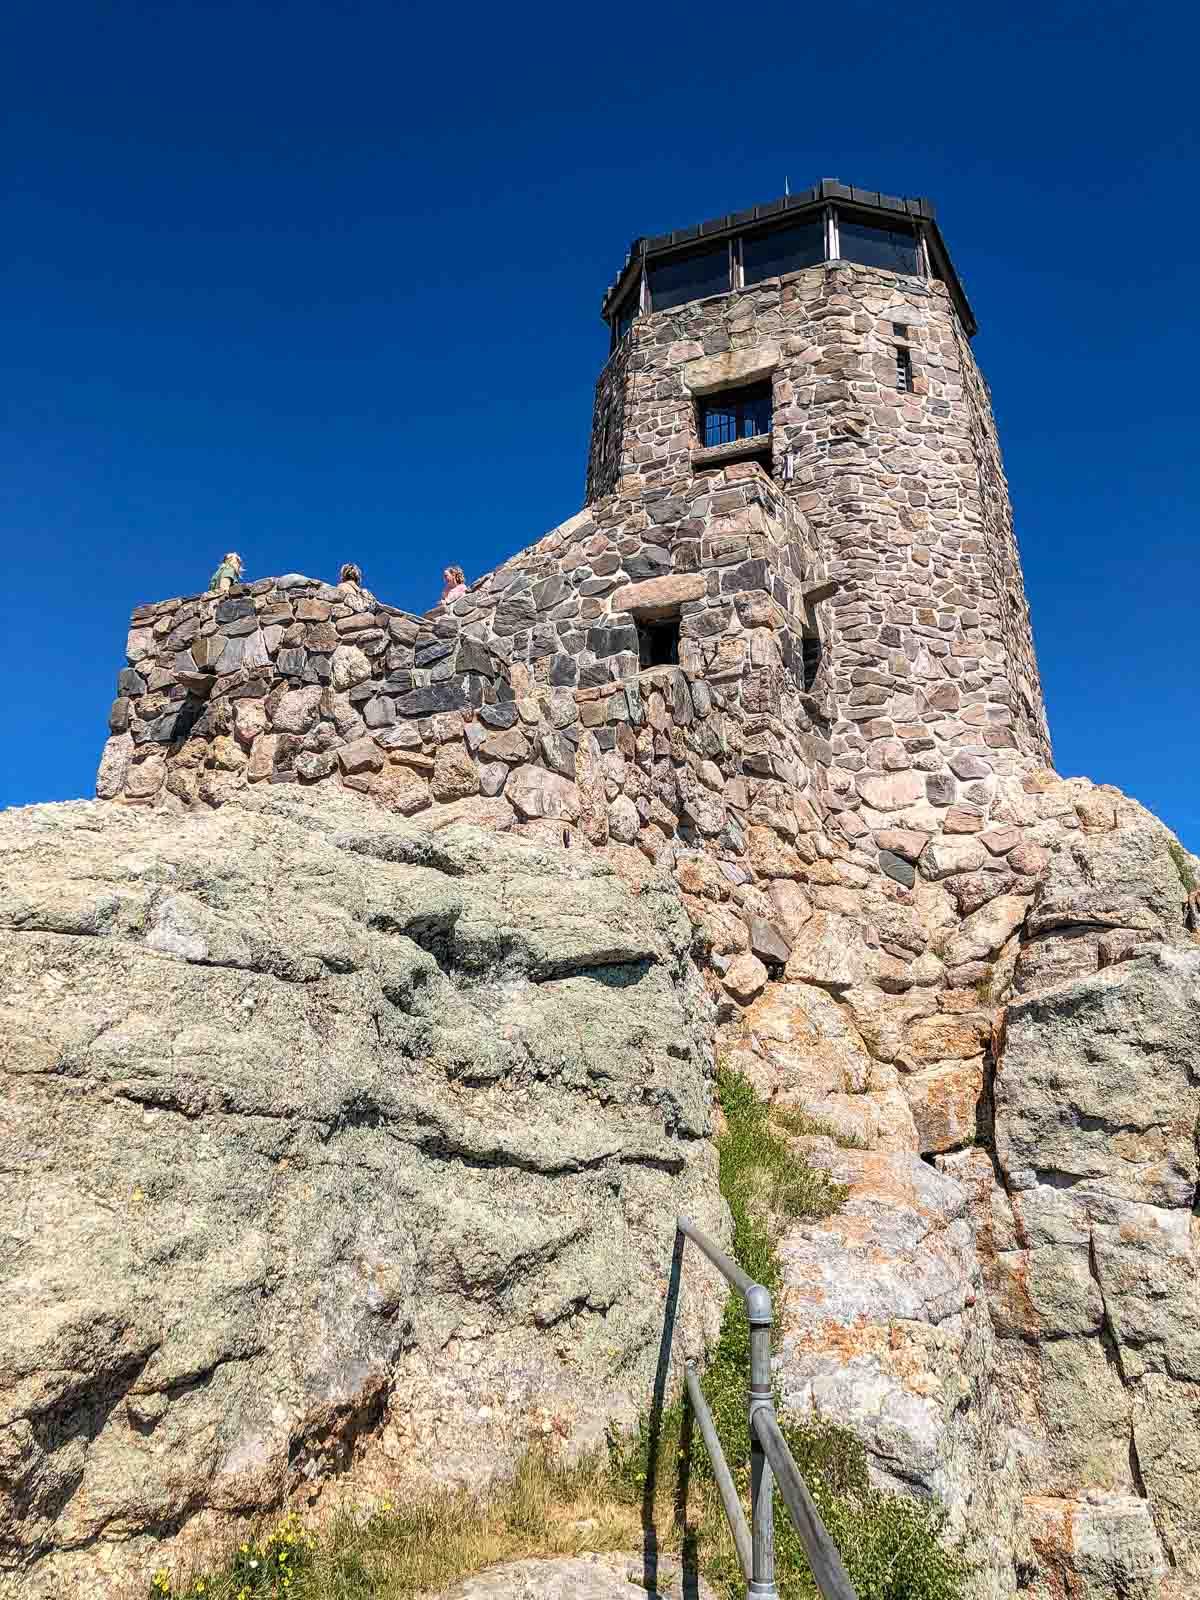 The fire lookout tower atop Black Elk Peak.